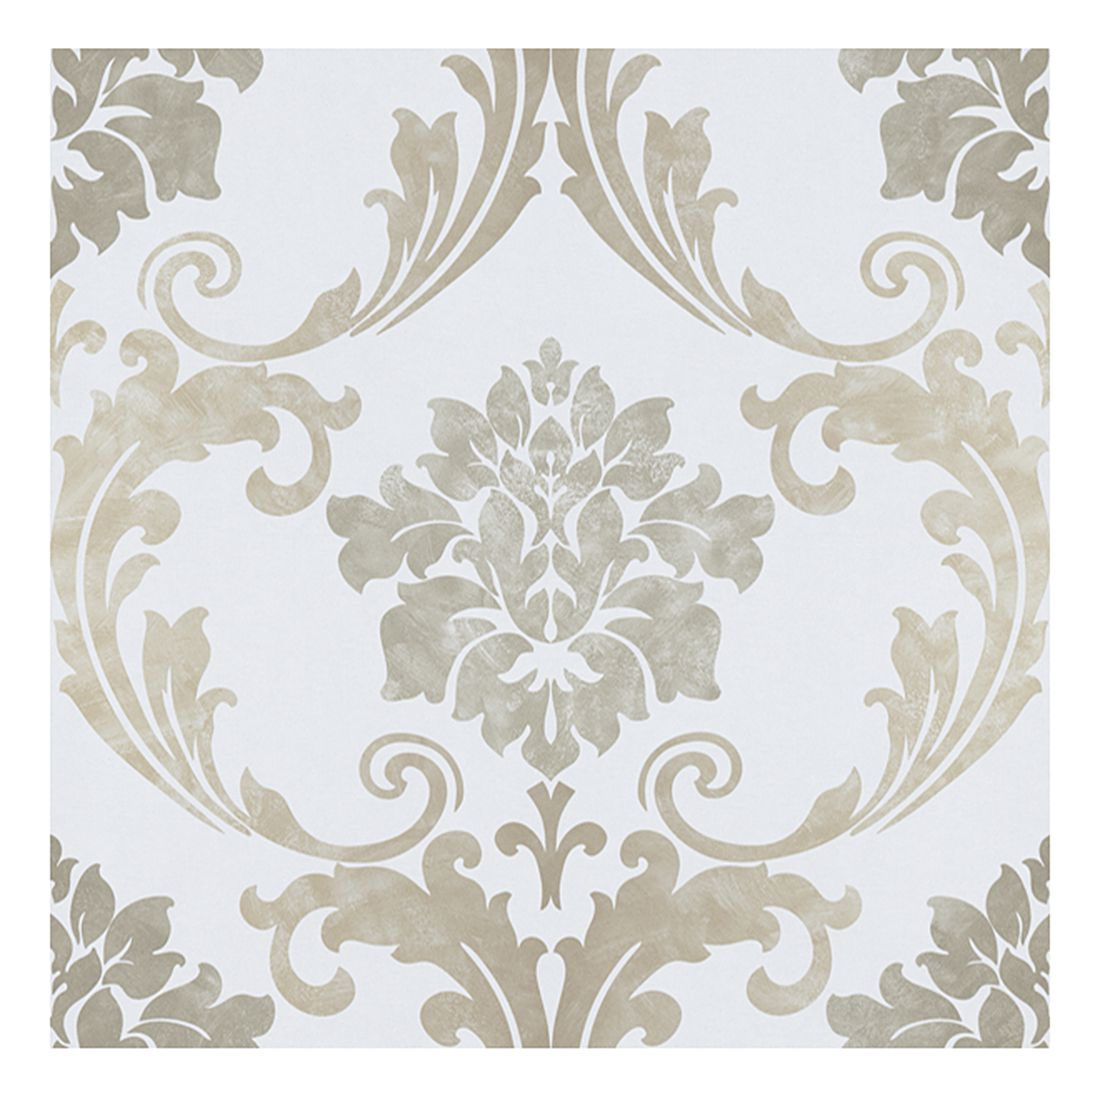 Papiertapete New Baroque – hellblau – goldfarben – metallic – glatt, Home24Deko günstig